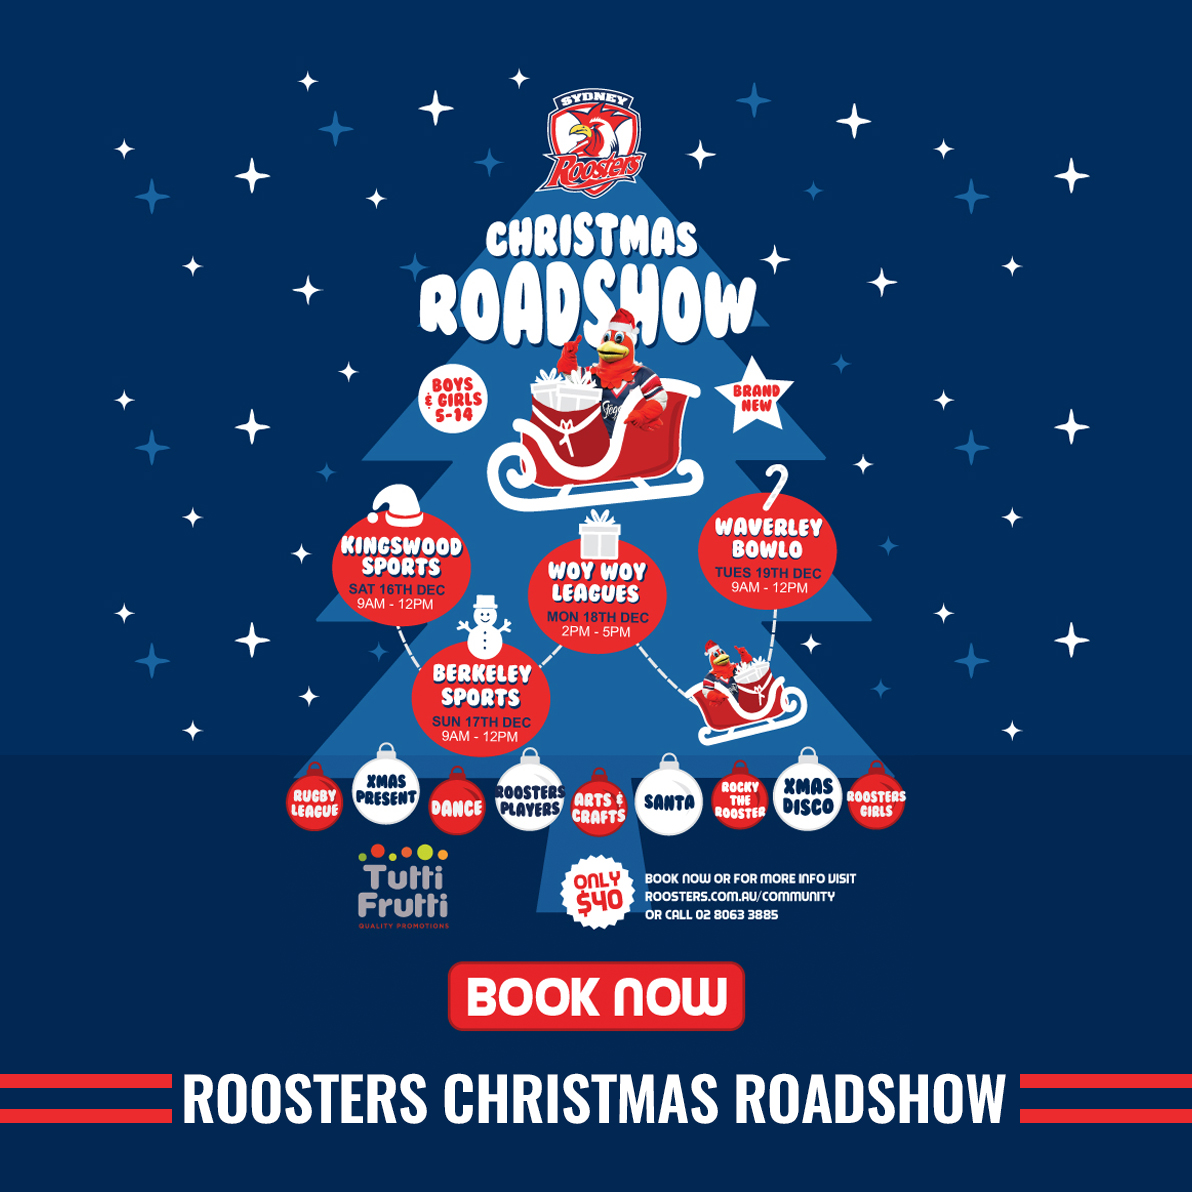 Roosters Christmas Roadshow.jpg